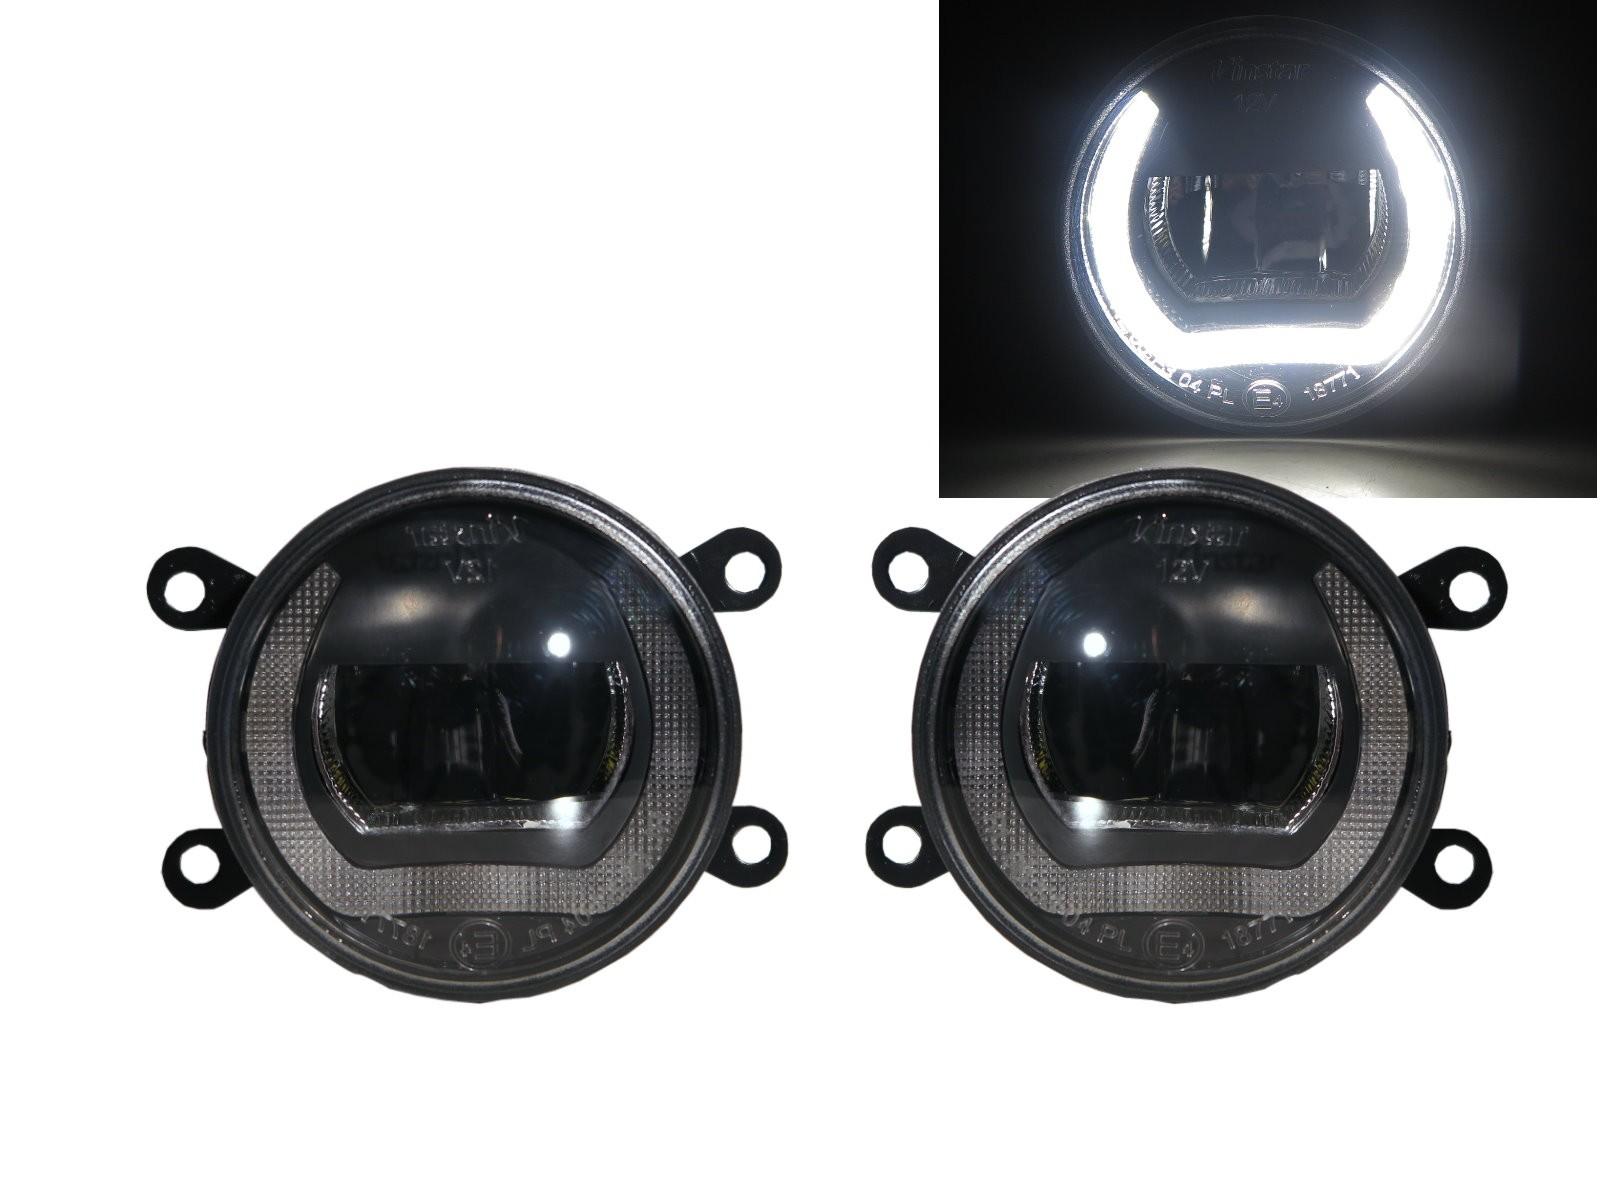 CrazyTheGod SX4 First generation 2006-2014 Sedan/Hatchback 4D/5D DRL Ubar LED Glass Fog Light Lamp Black for SUZUKI